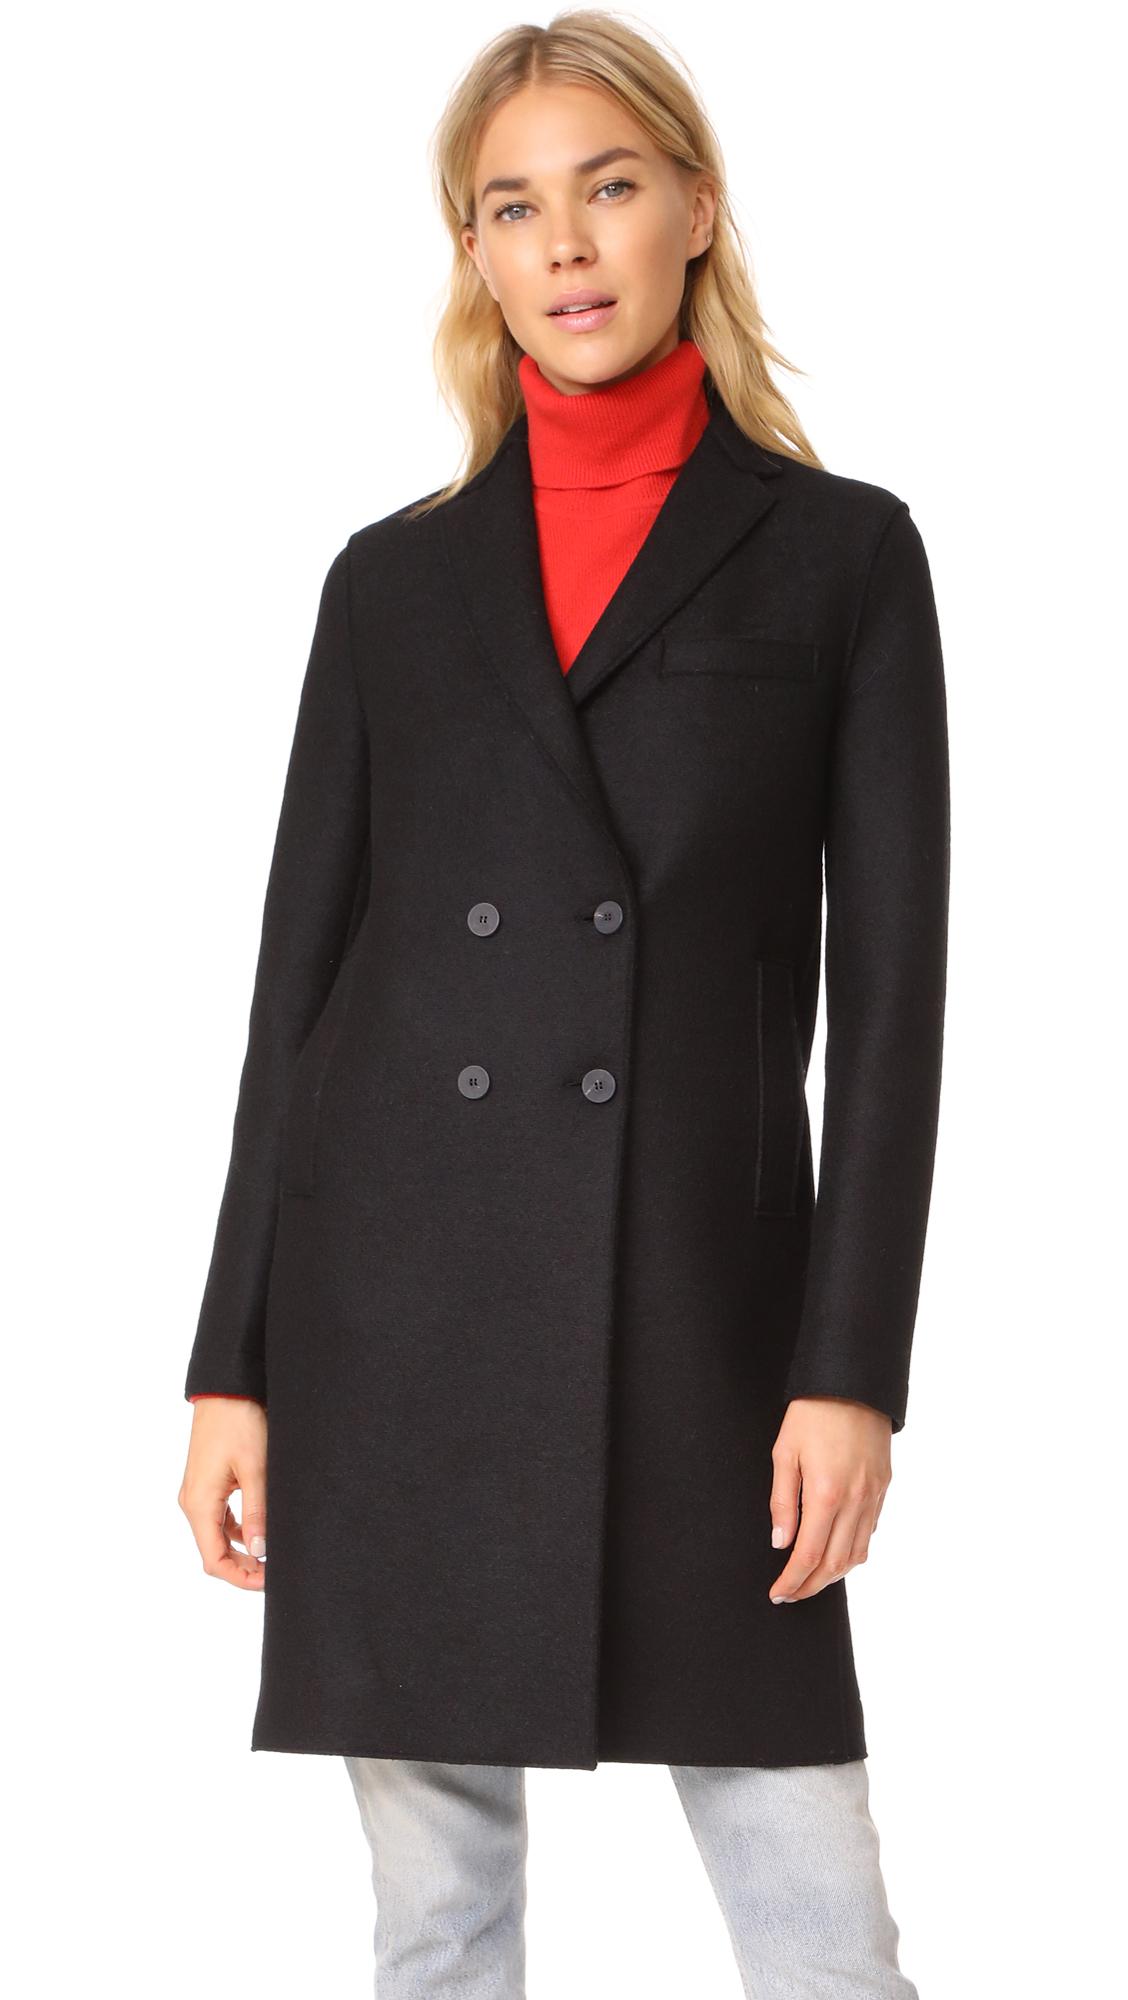 Harris Wharf London Boxy DB Coat - Black